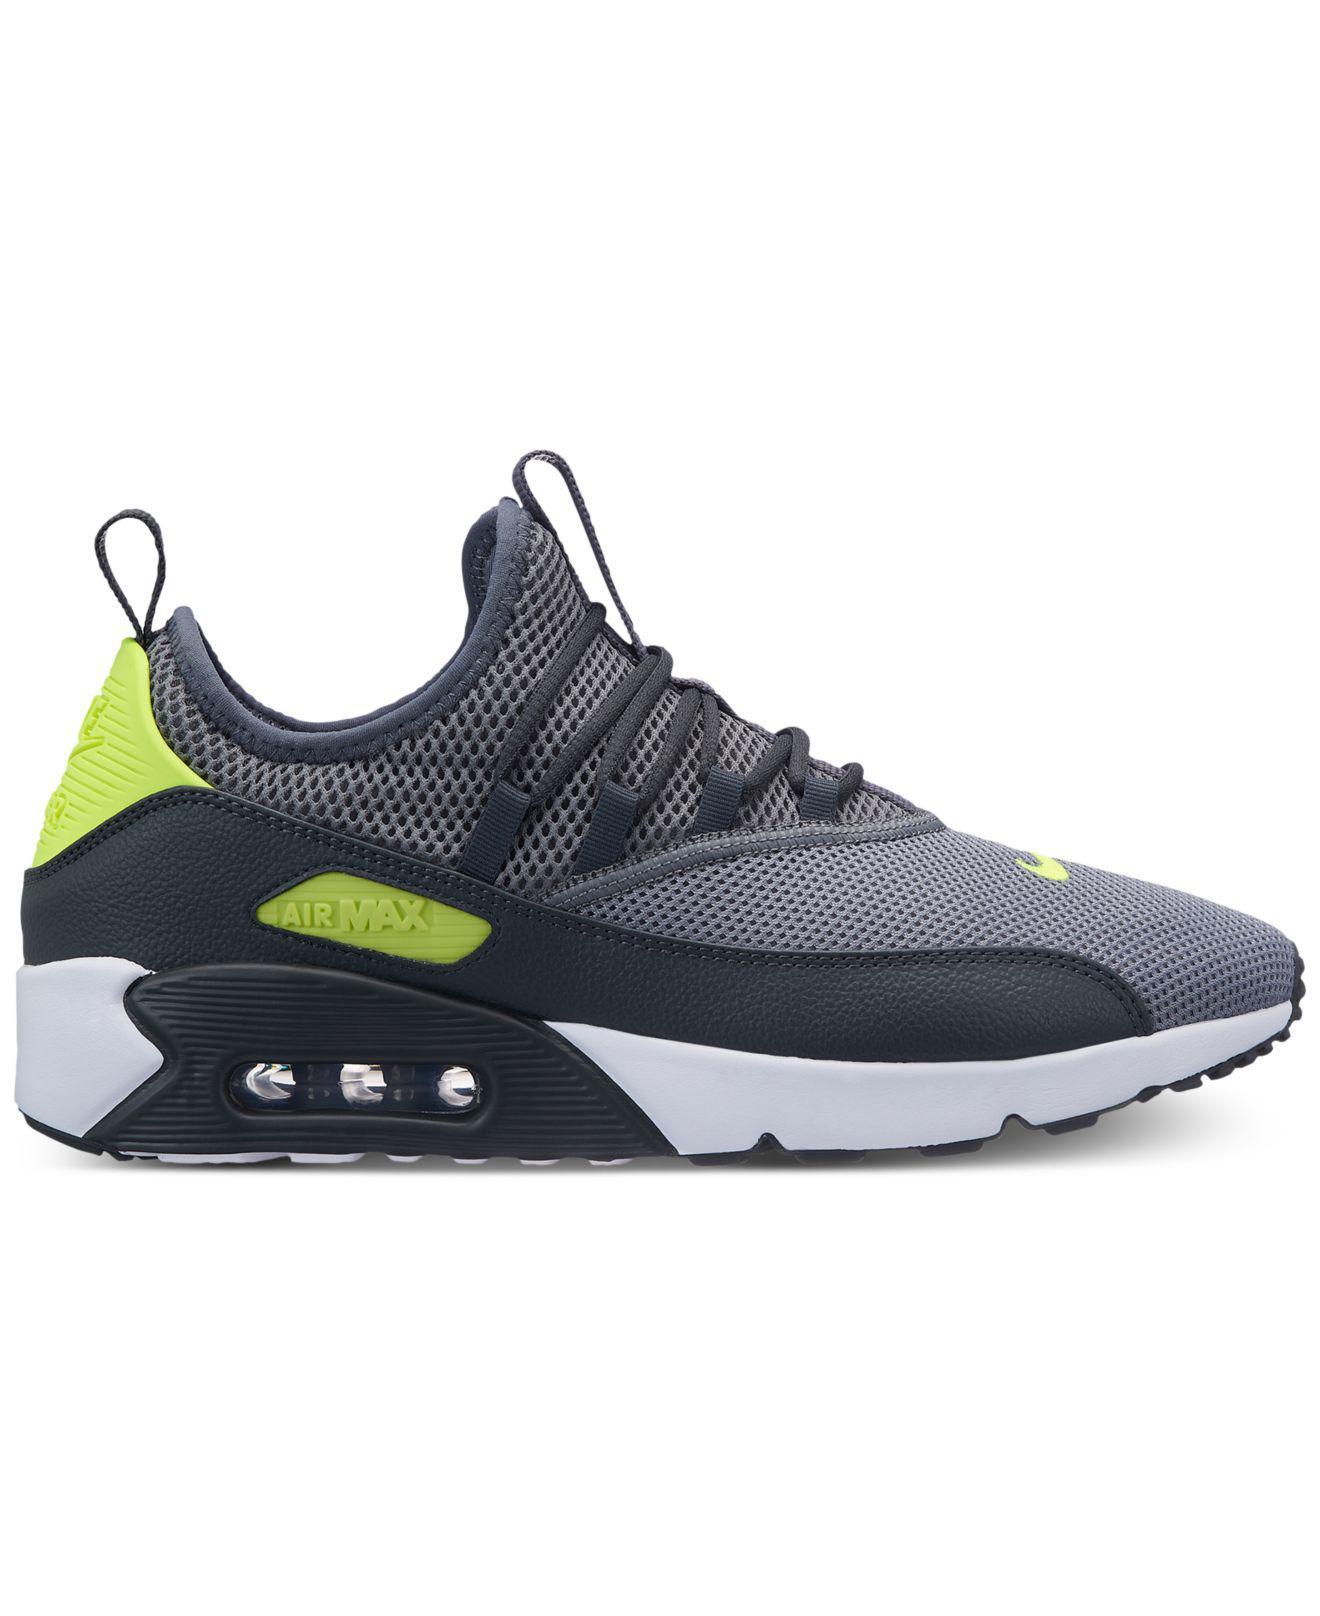 Nike Air Max Plus Tn Ligne D'arrivée Ultra